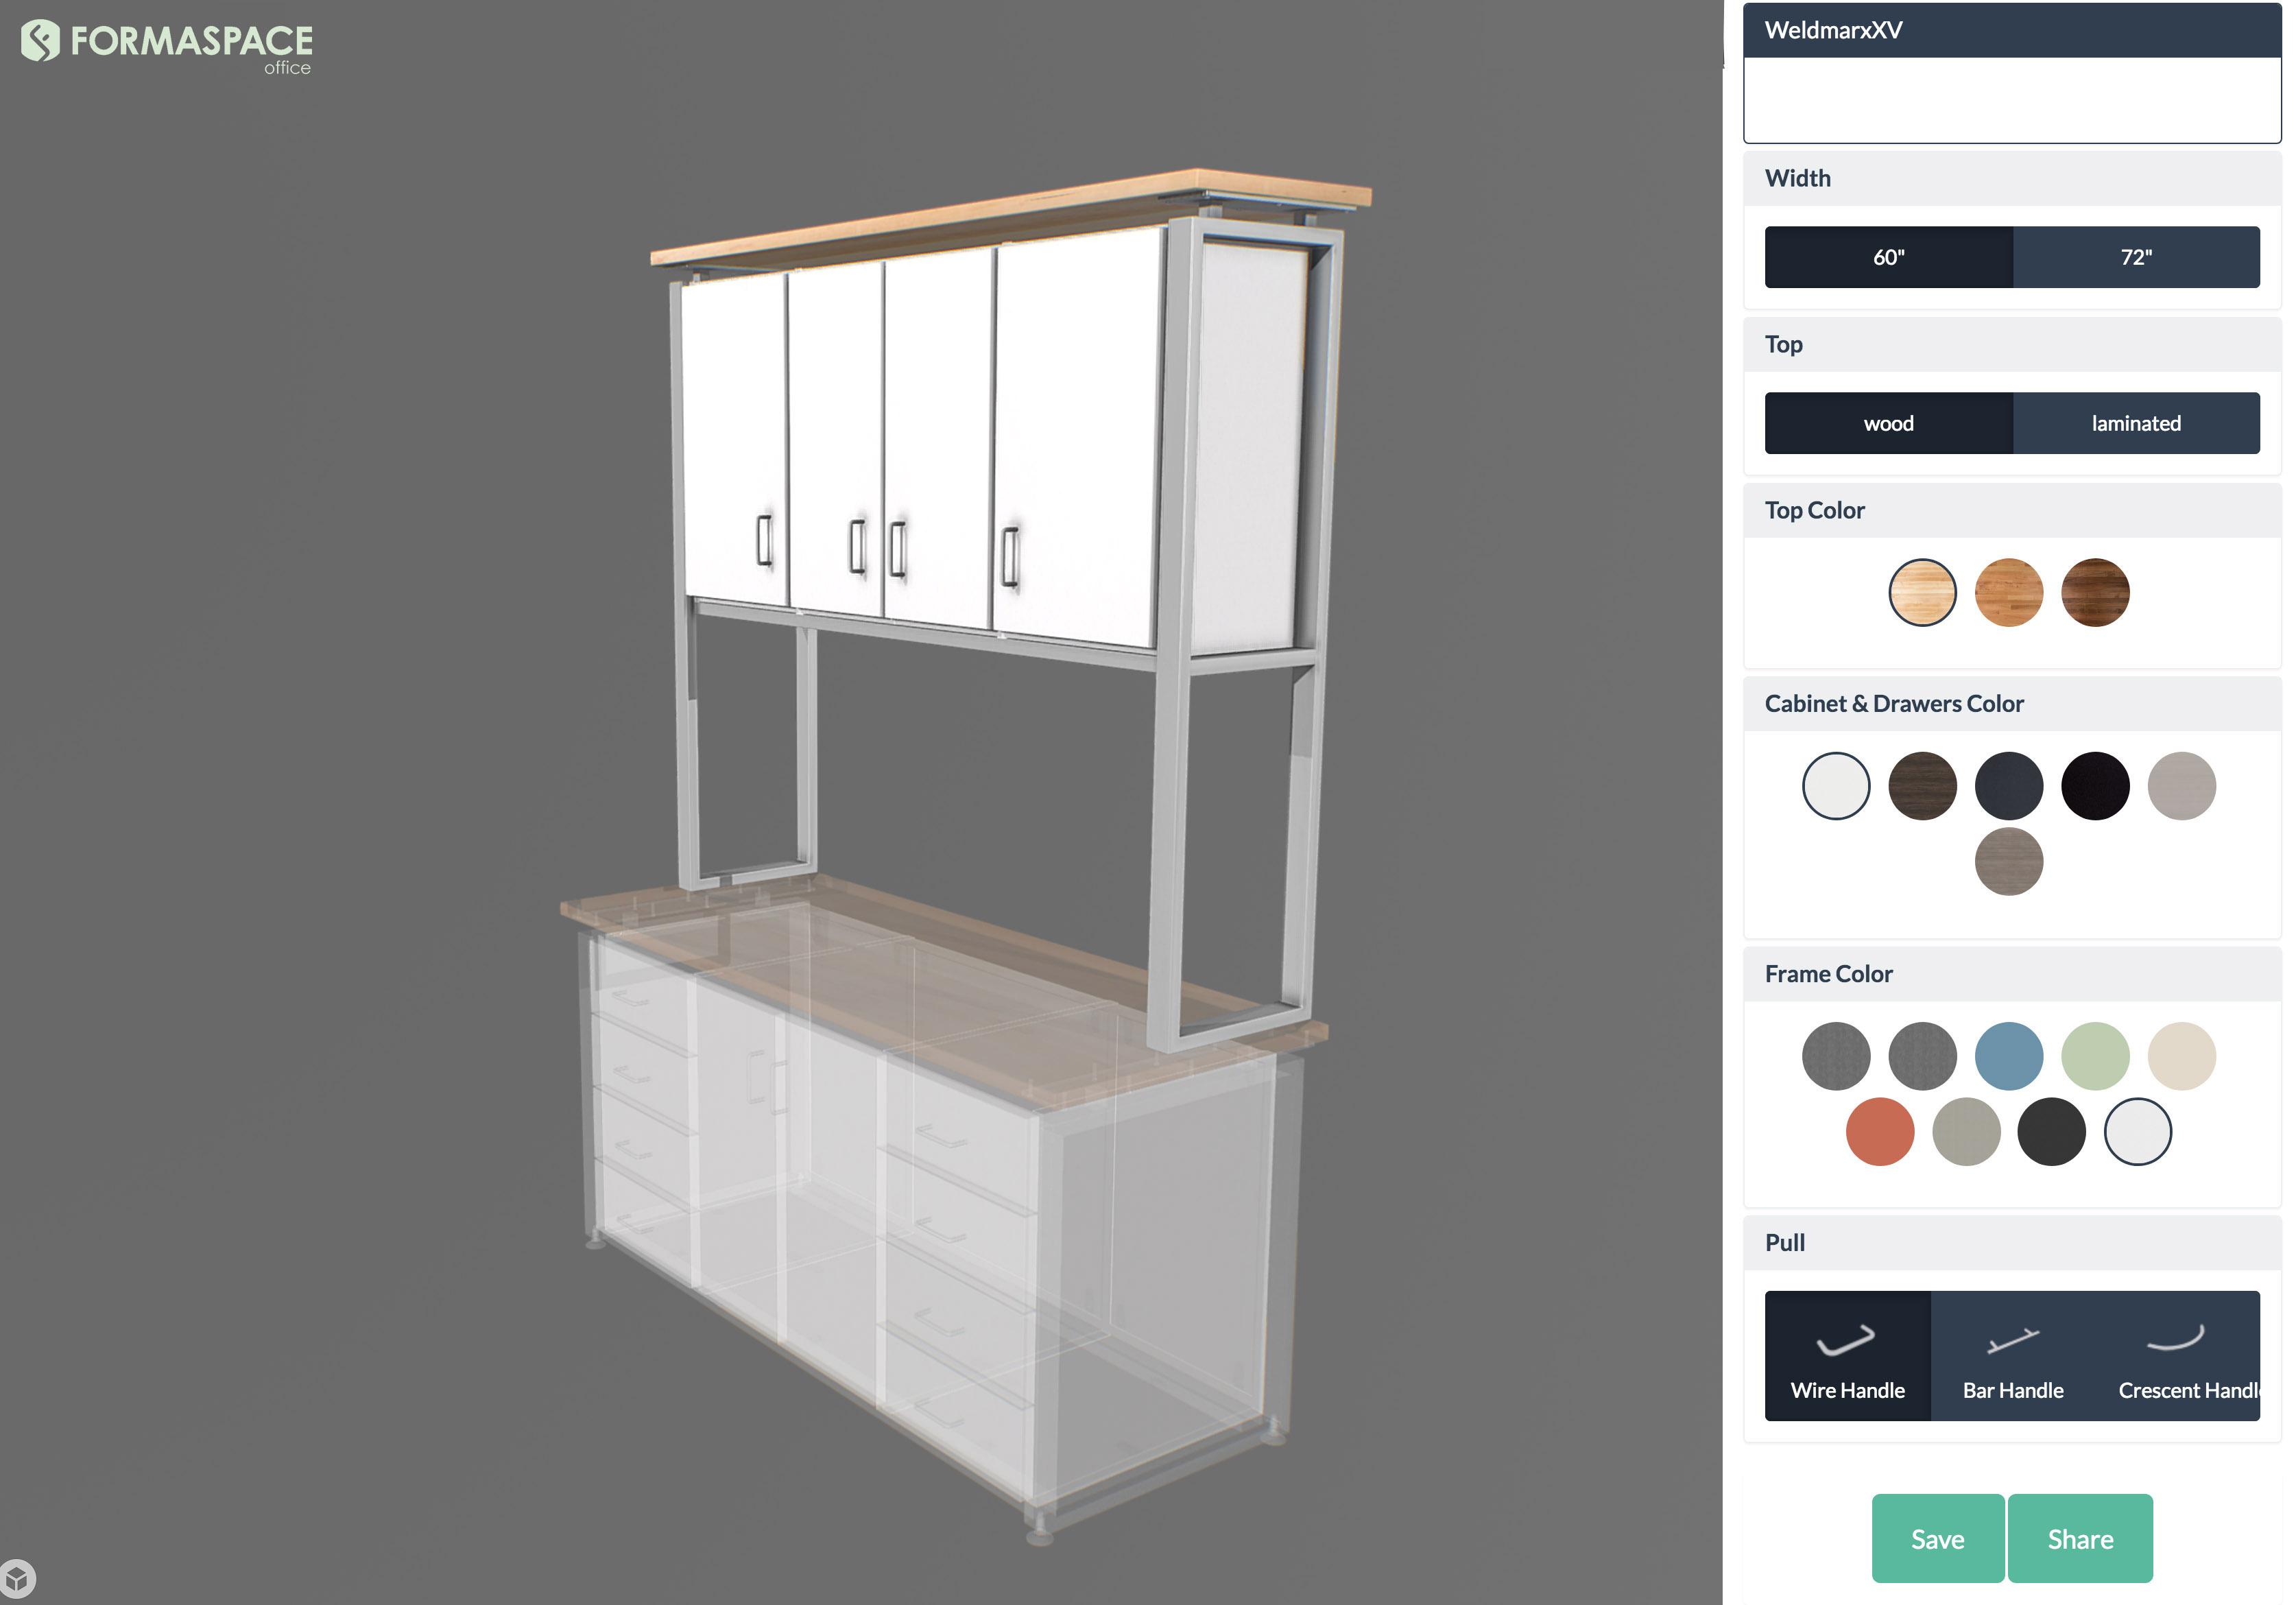 Formaspace Office 3D Configurator